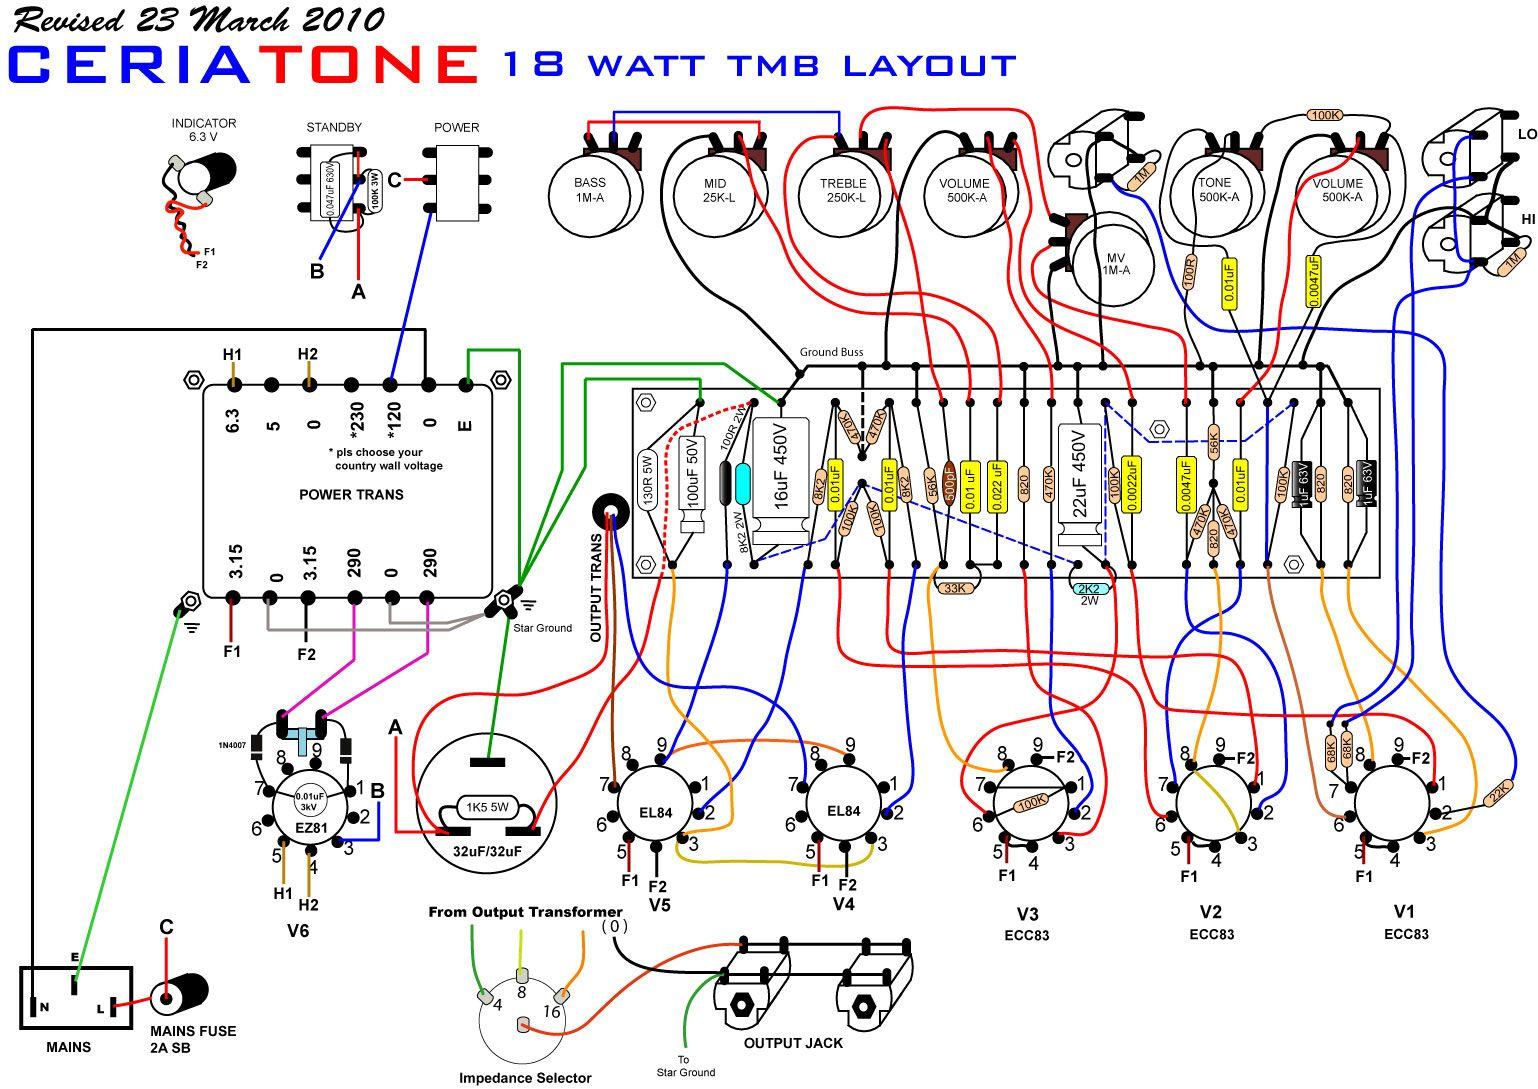 marshall layout 18watttmb guitar amps in 2019 valve. Black Bedroom Furniture Sets. Home Design Ideas